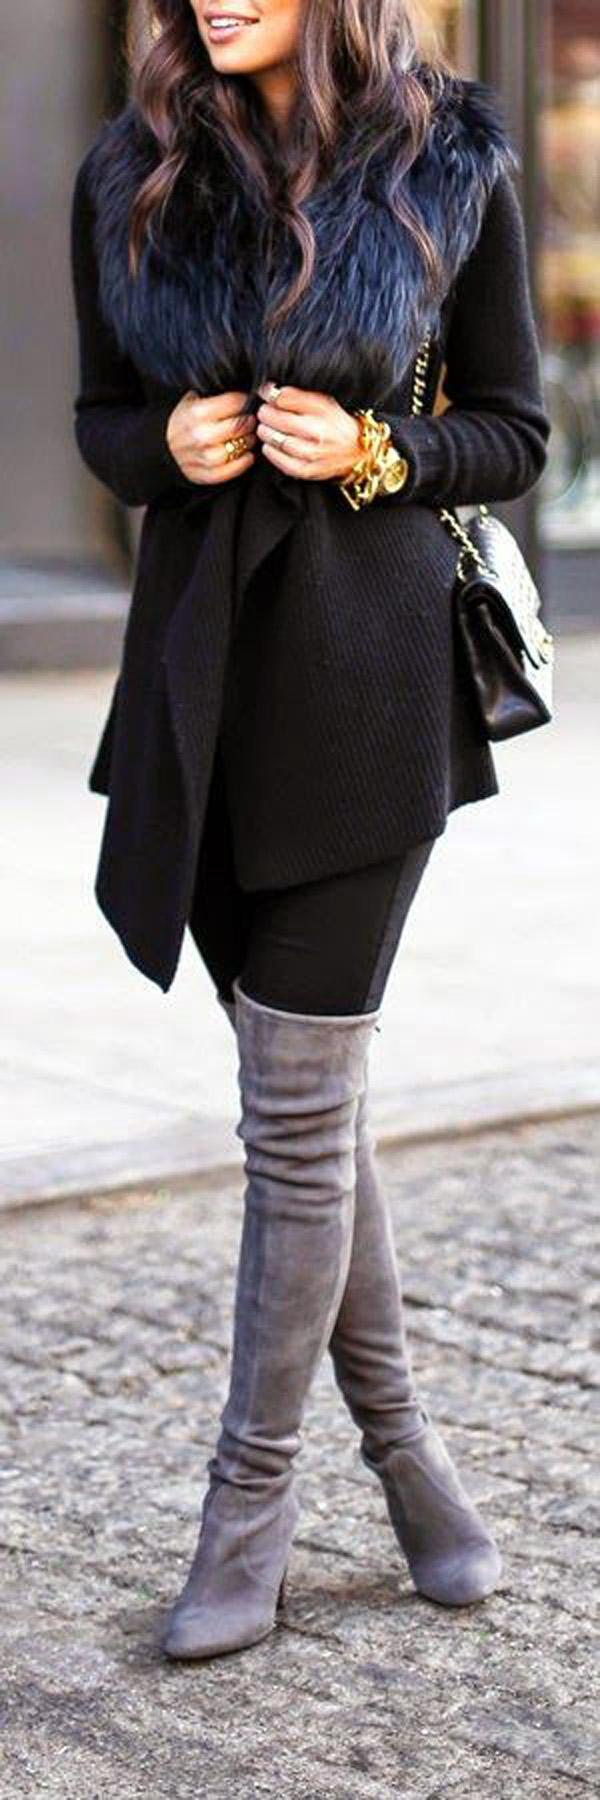 winter street style-9